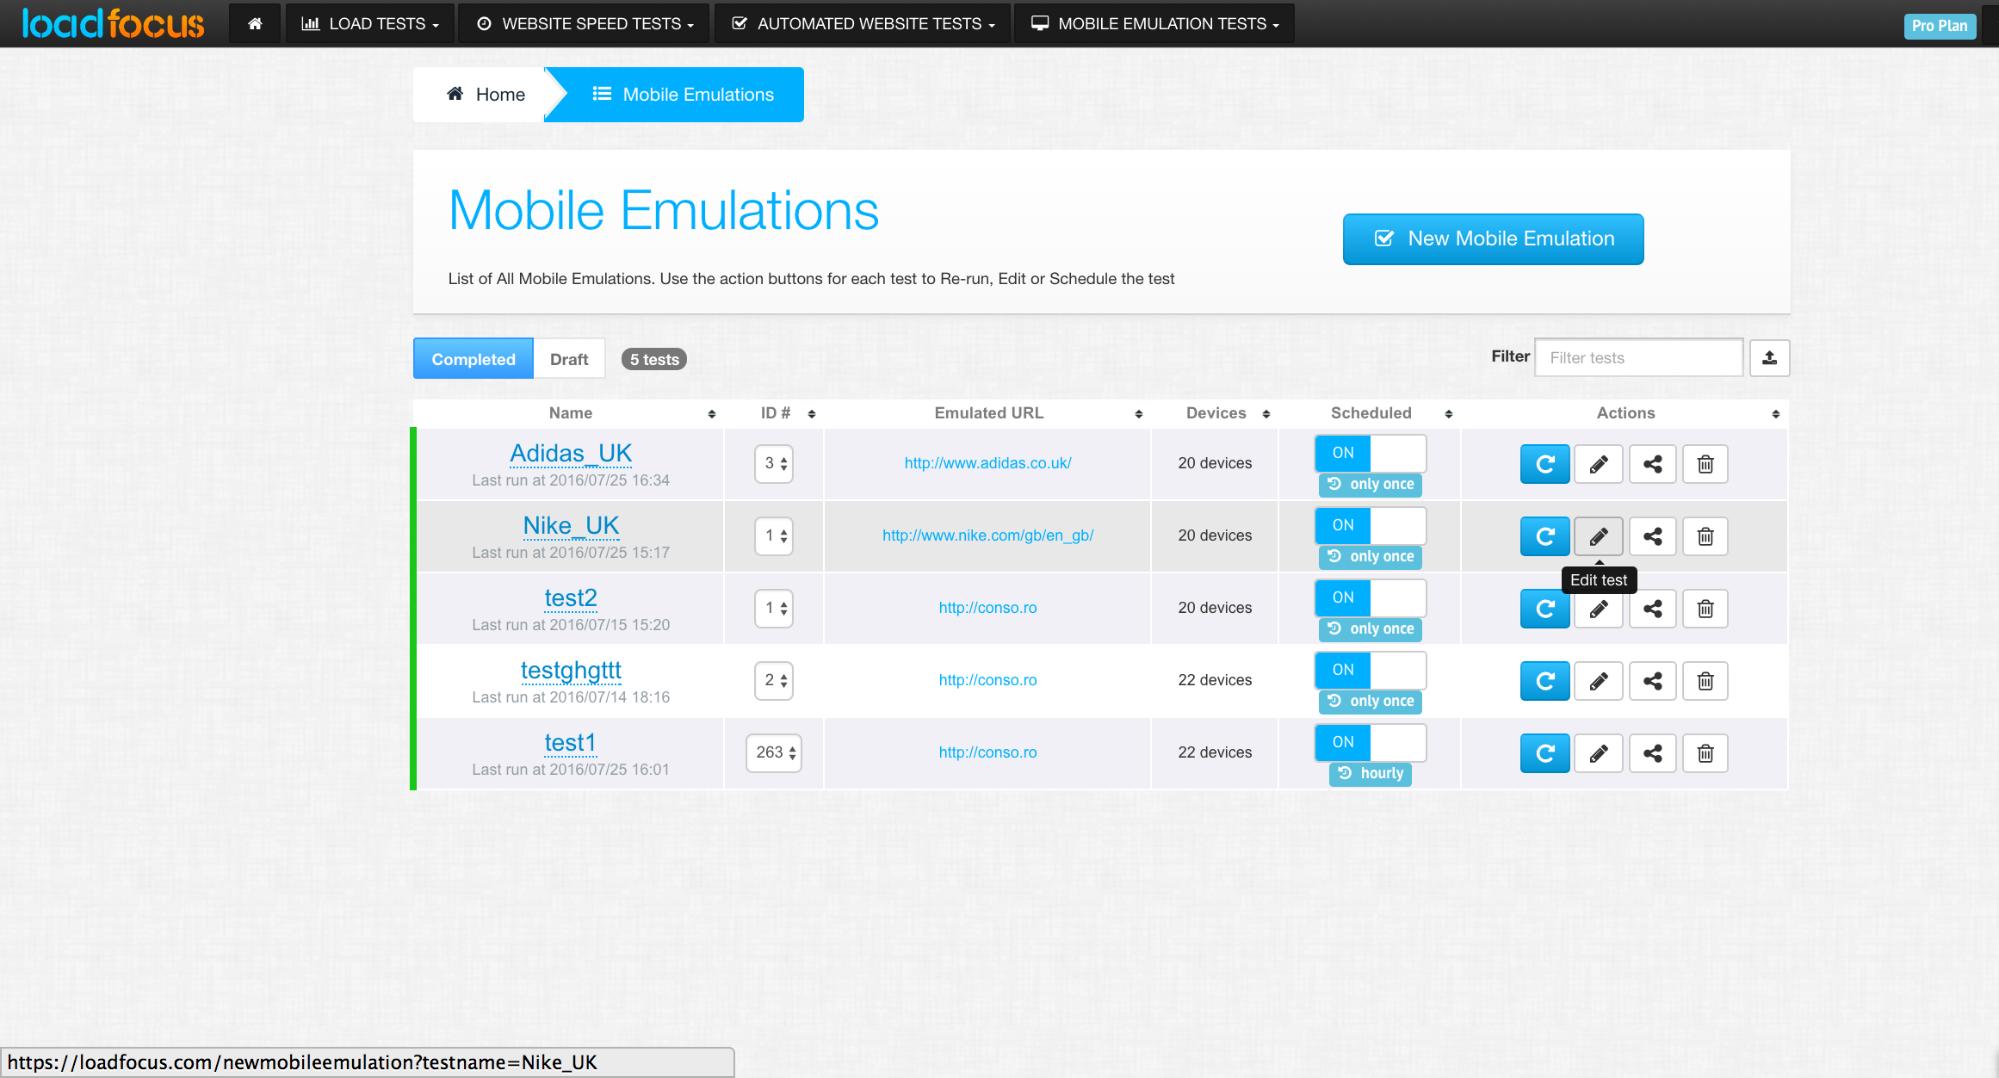 mobile-emulation-schedule-list